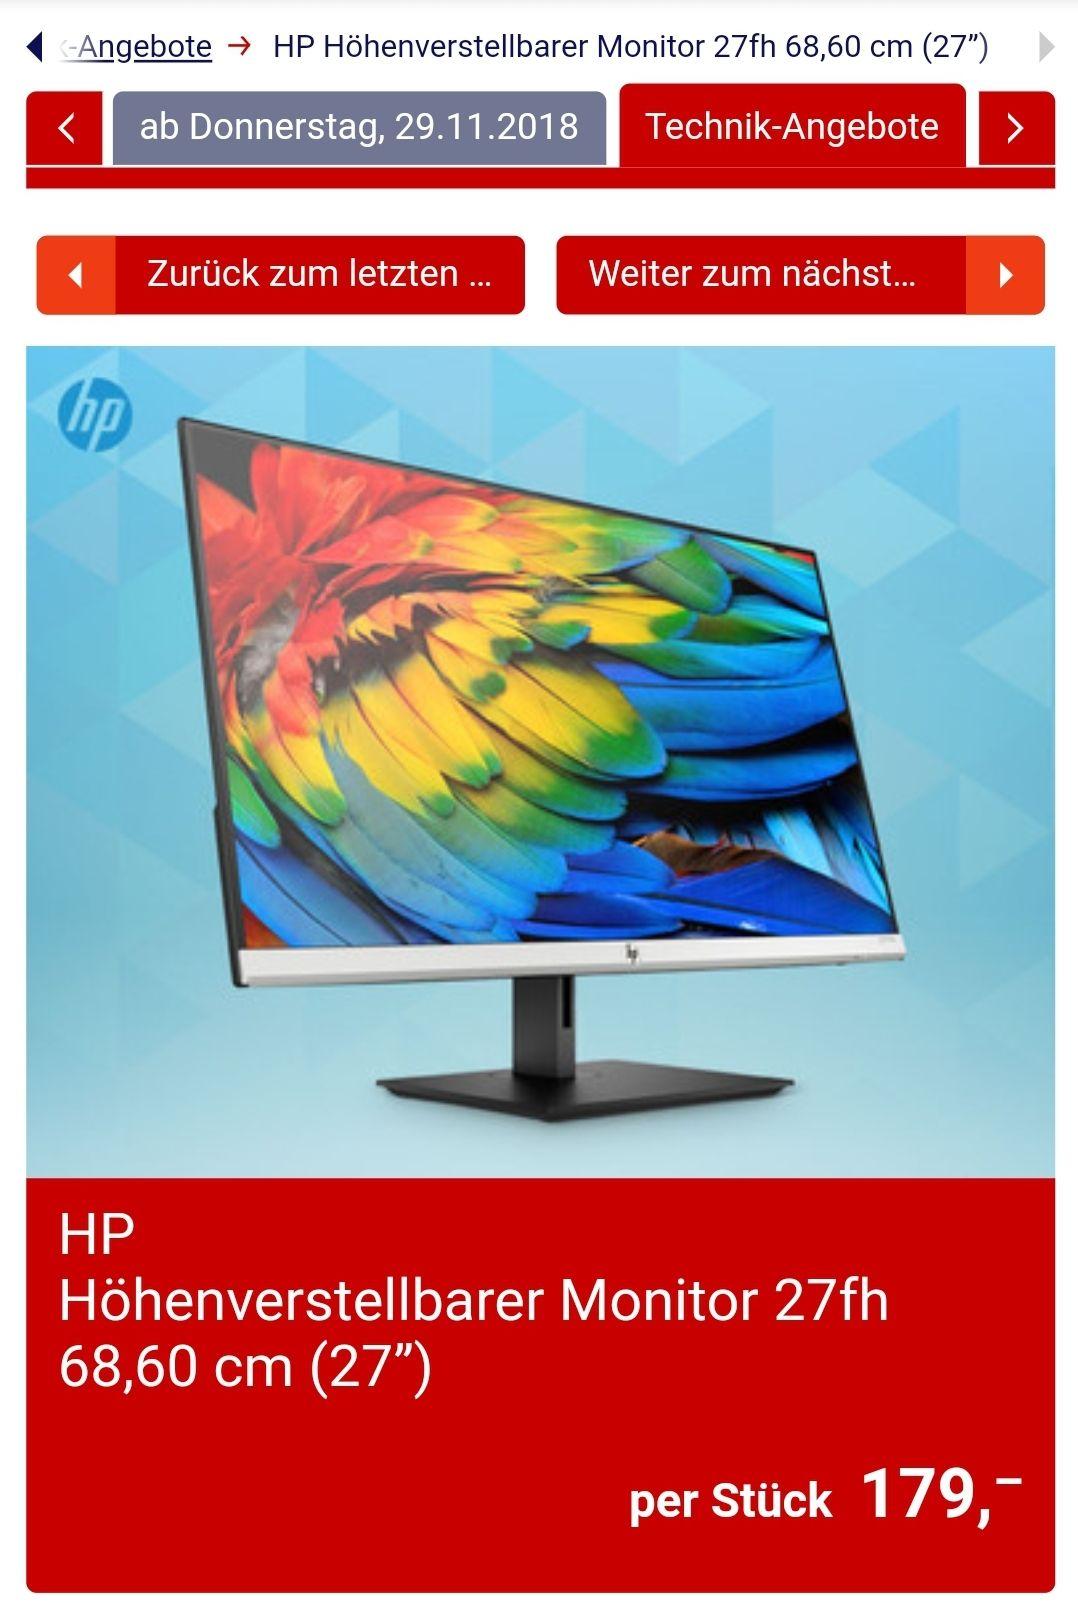 "HP Höhenverstellbarer Monitor 27fh 68,60 cm (27"")"